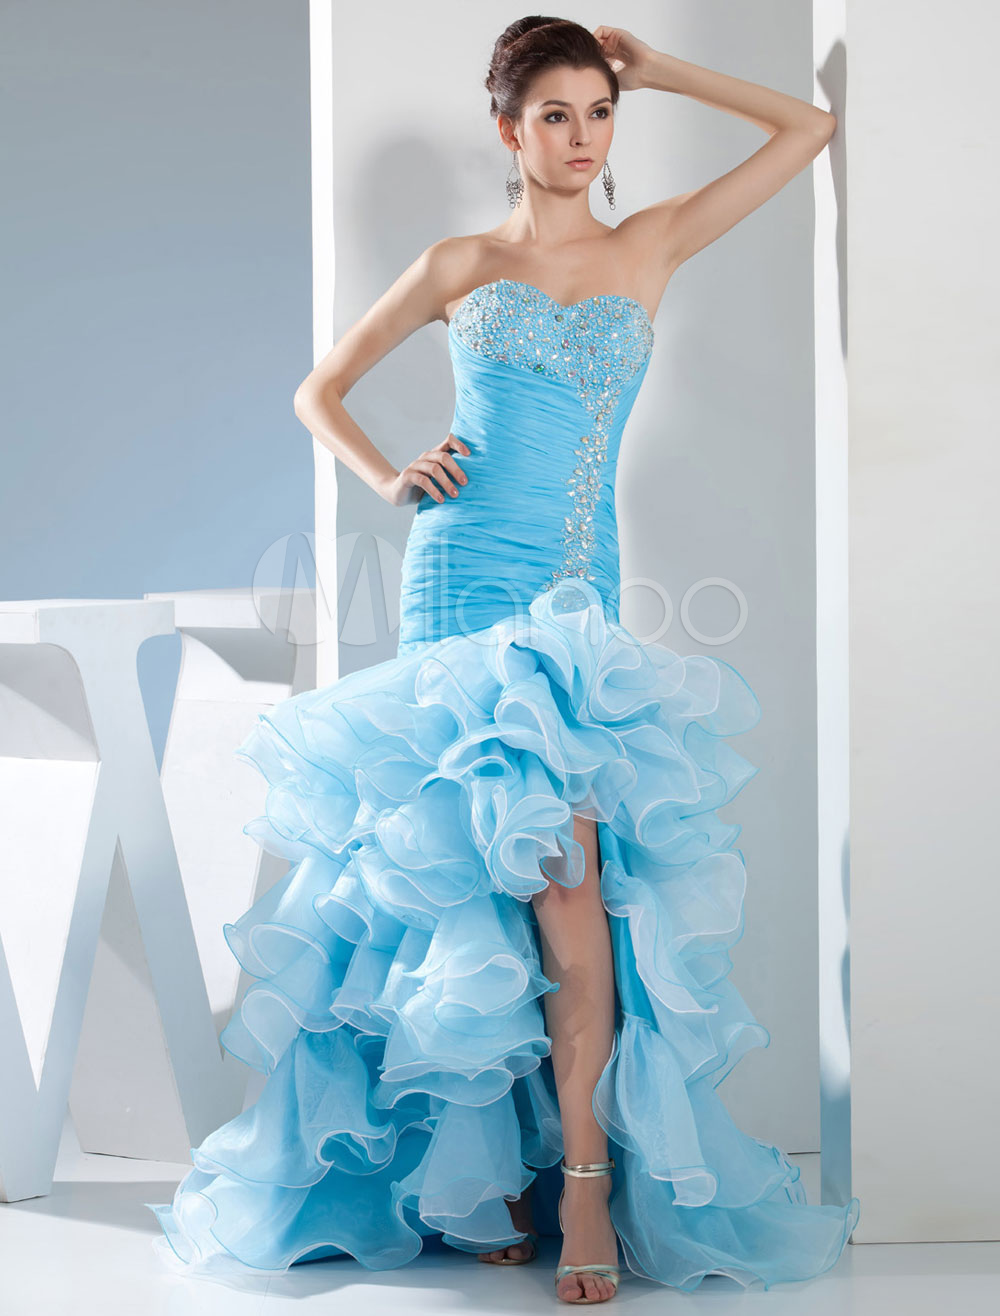 High-Low Homecoming Dress Strapless Sweetheart Pleats Beading Organza Ruffles Court Train Mermaid Prom Dress Milanoo